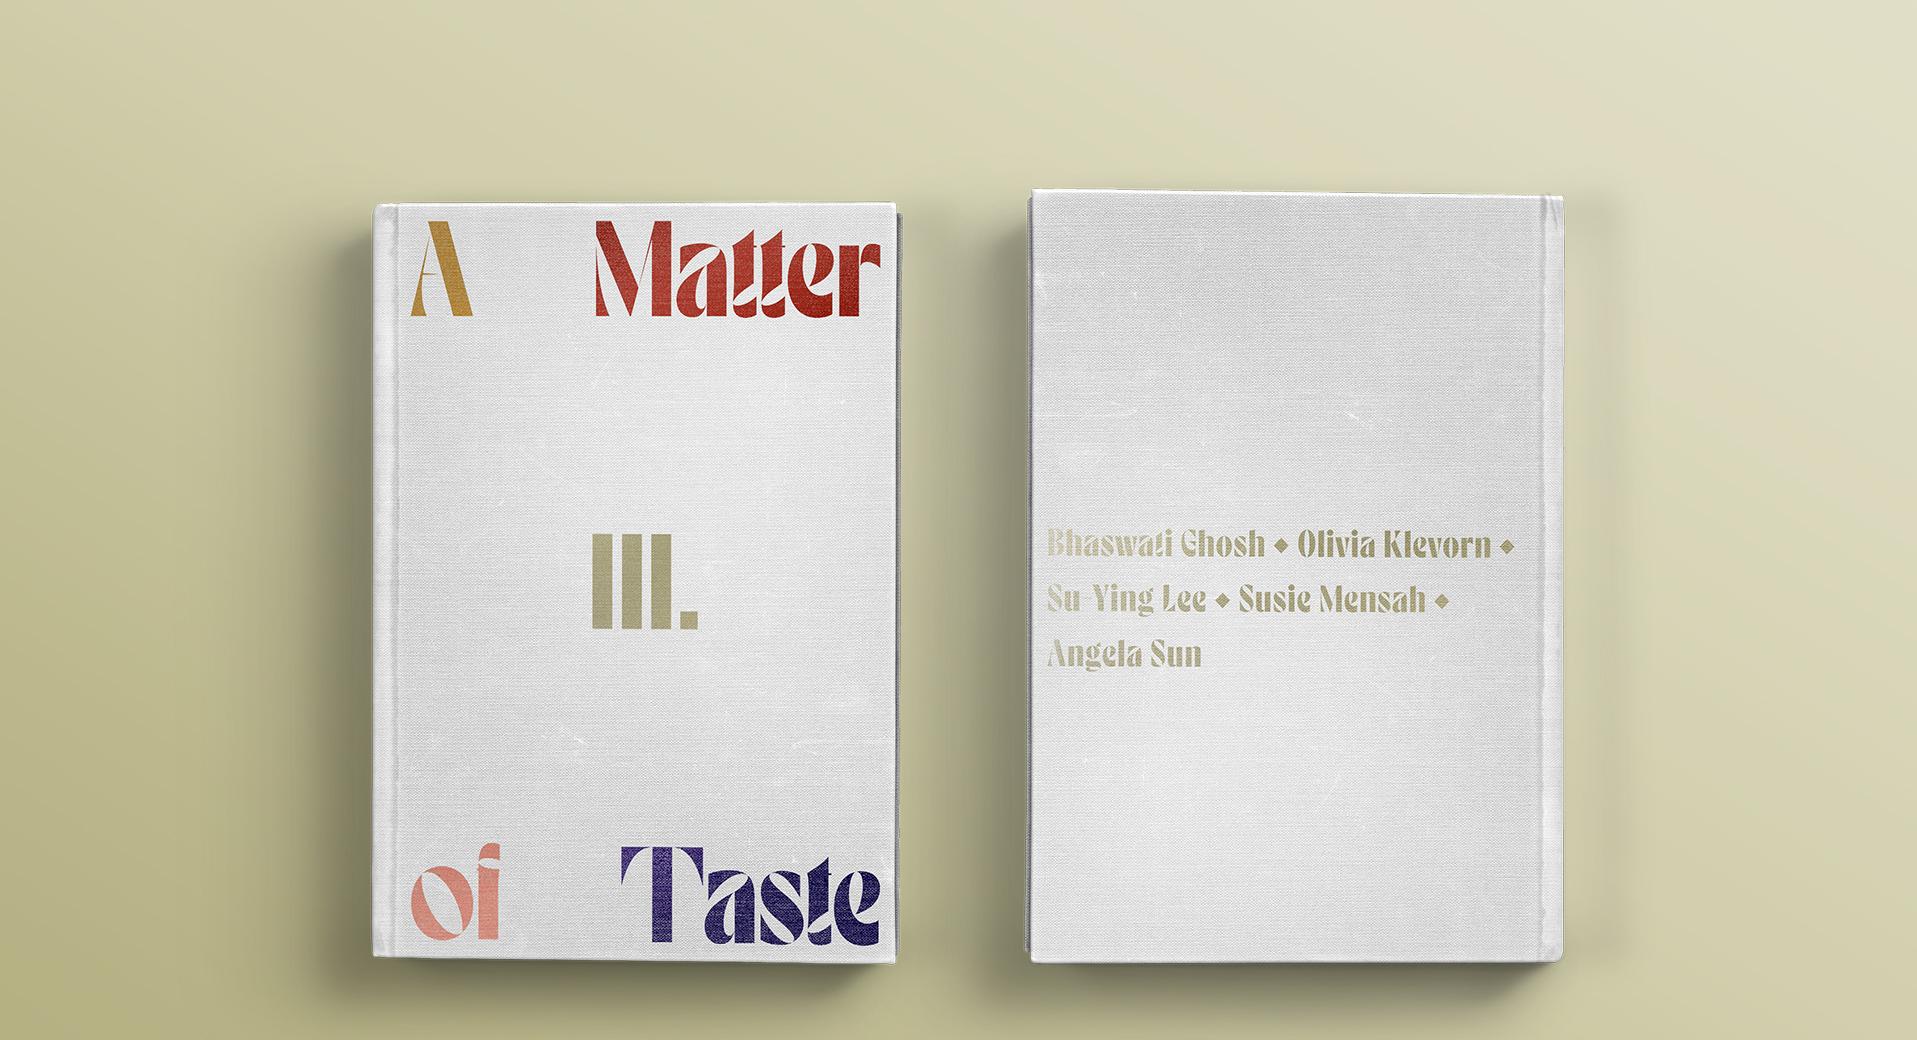 A Matter of Taste Chapter Three: Bhaswati Ghosh, Olivia Klevorn, Su-Ying Lee, Susie Mensah, Angela Sun